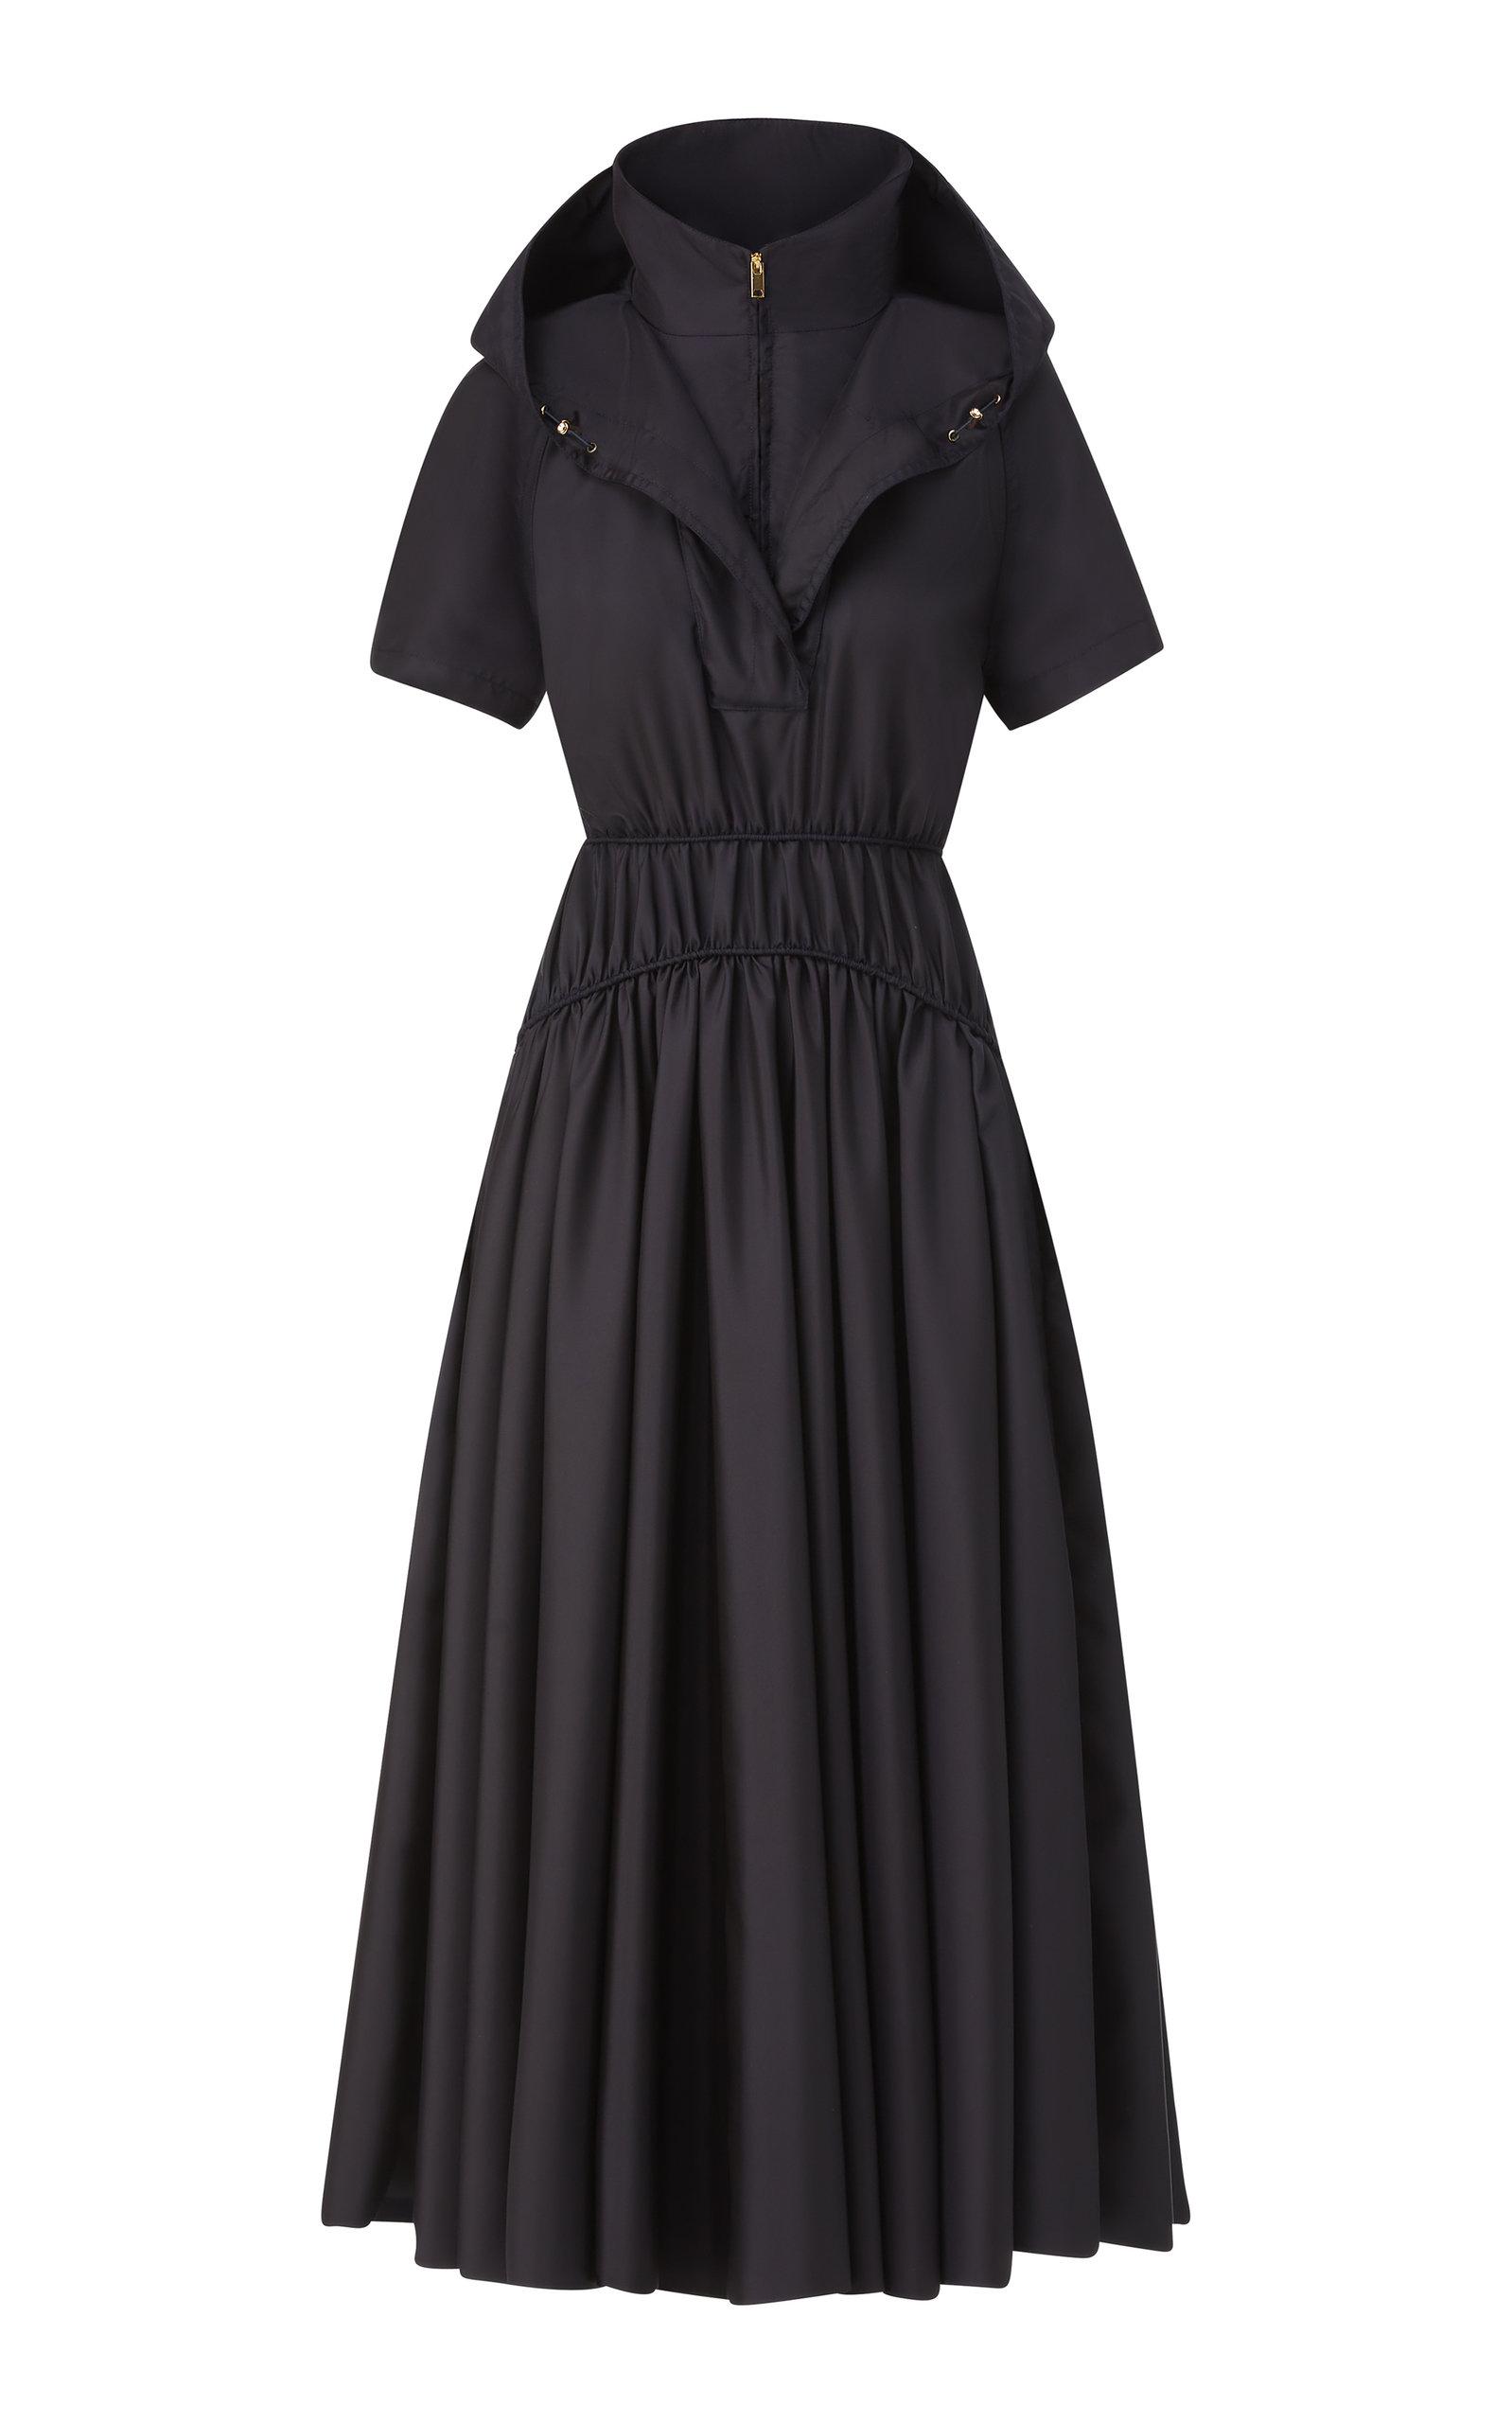 Women's Taffeta Parka Dress